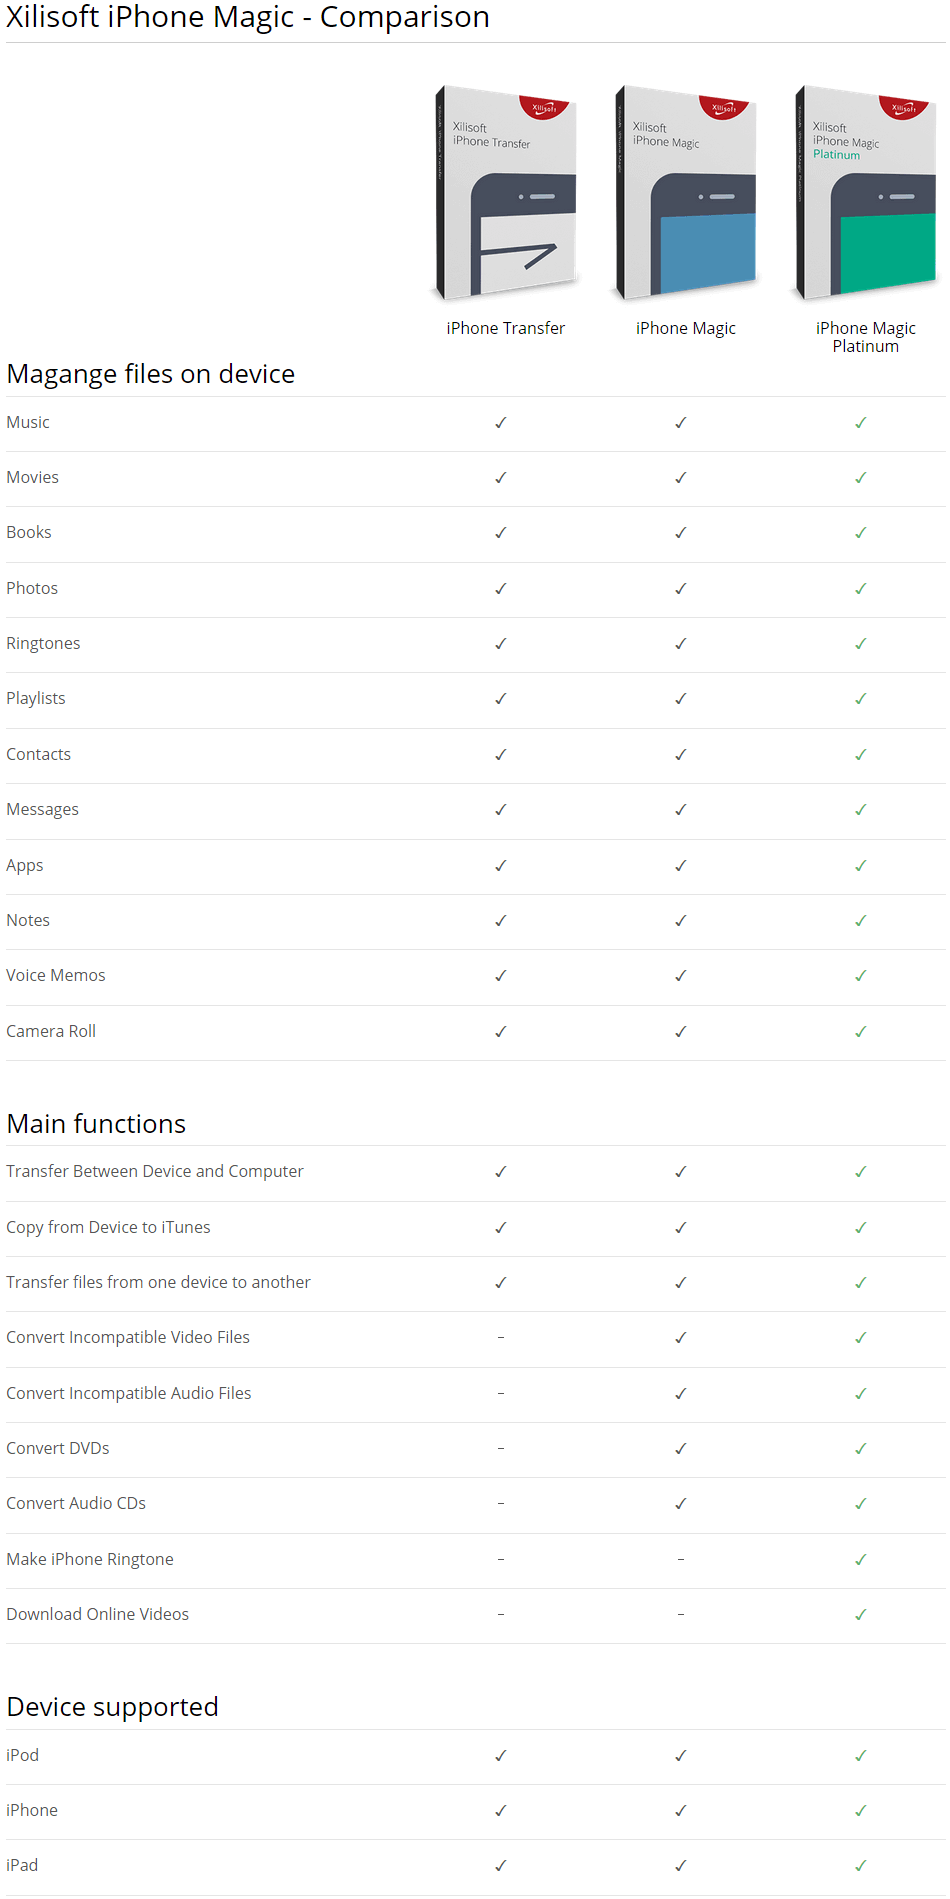 Xilisoft iPhone Magic Platinum 58% OFF Coupon (100% Working)